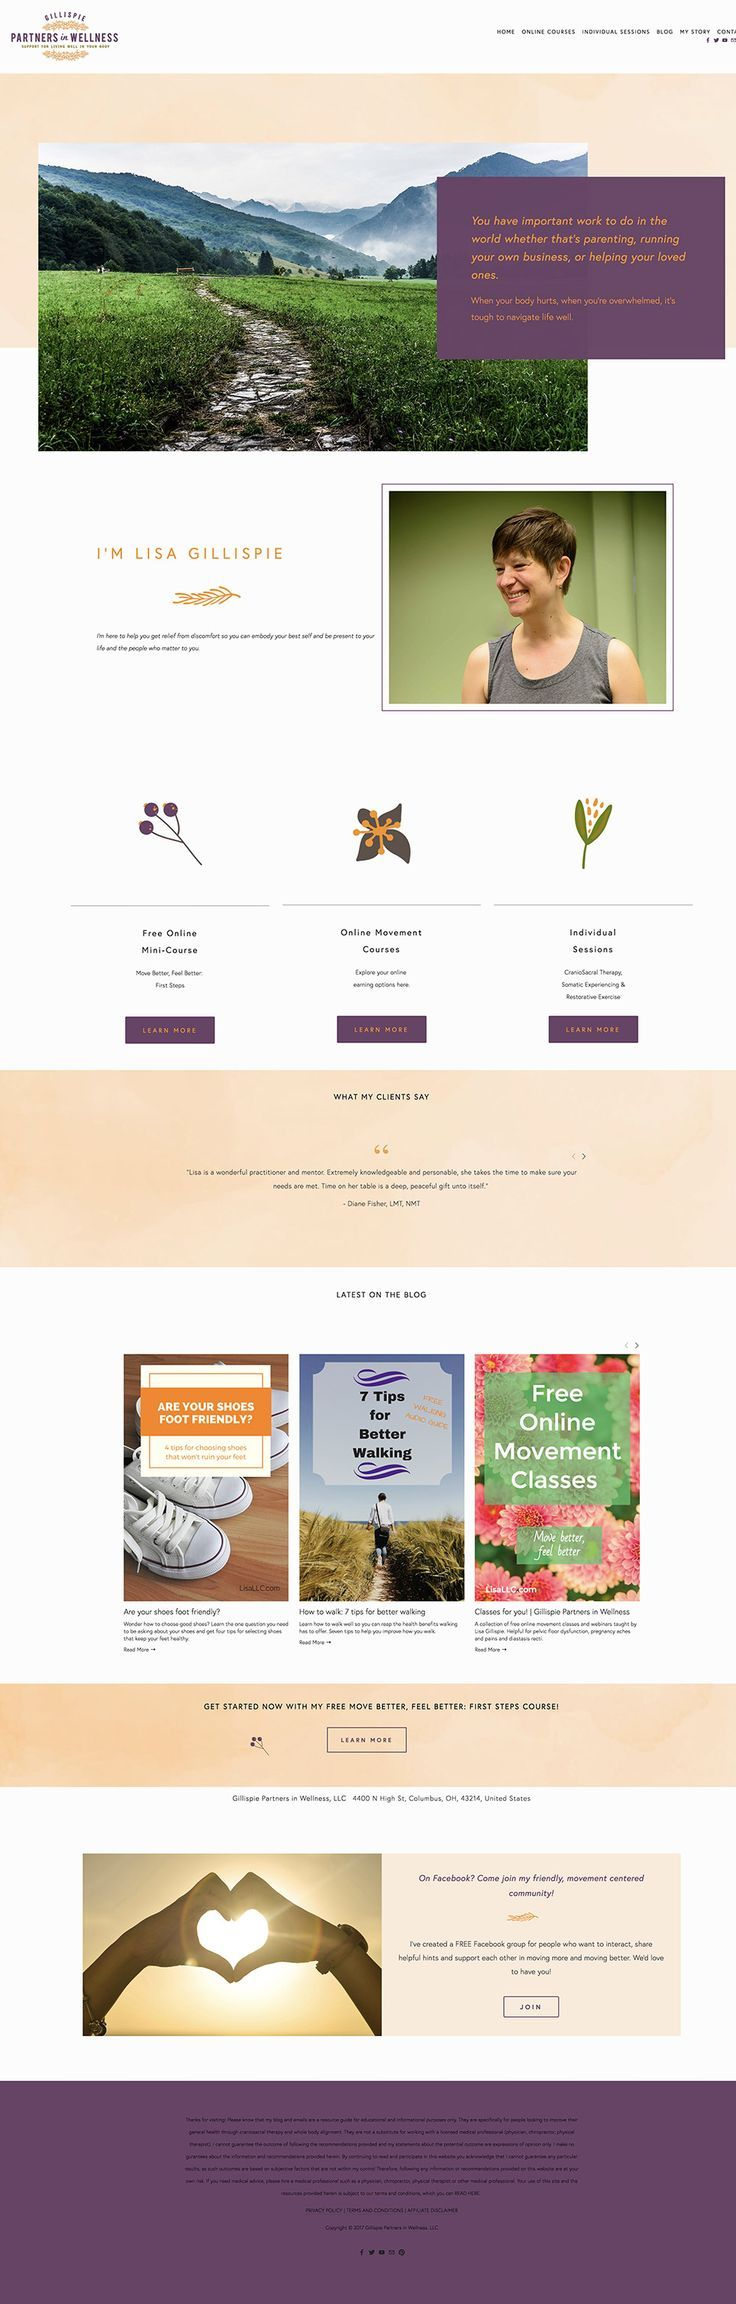 Gillispie Partners in Wellness website design —  Squarespace Web Design Services | Jodi Neufeld Design